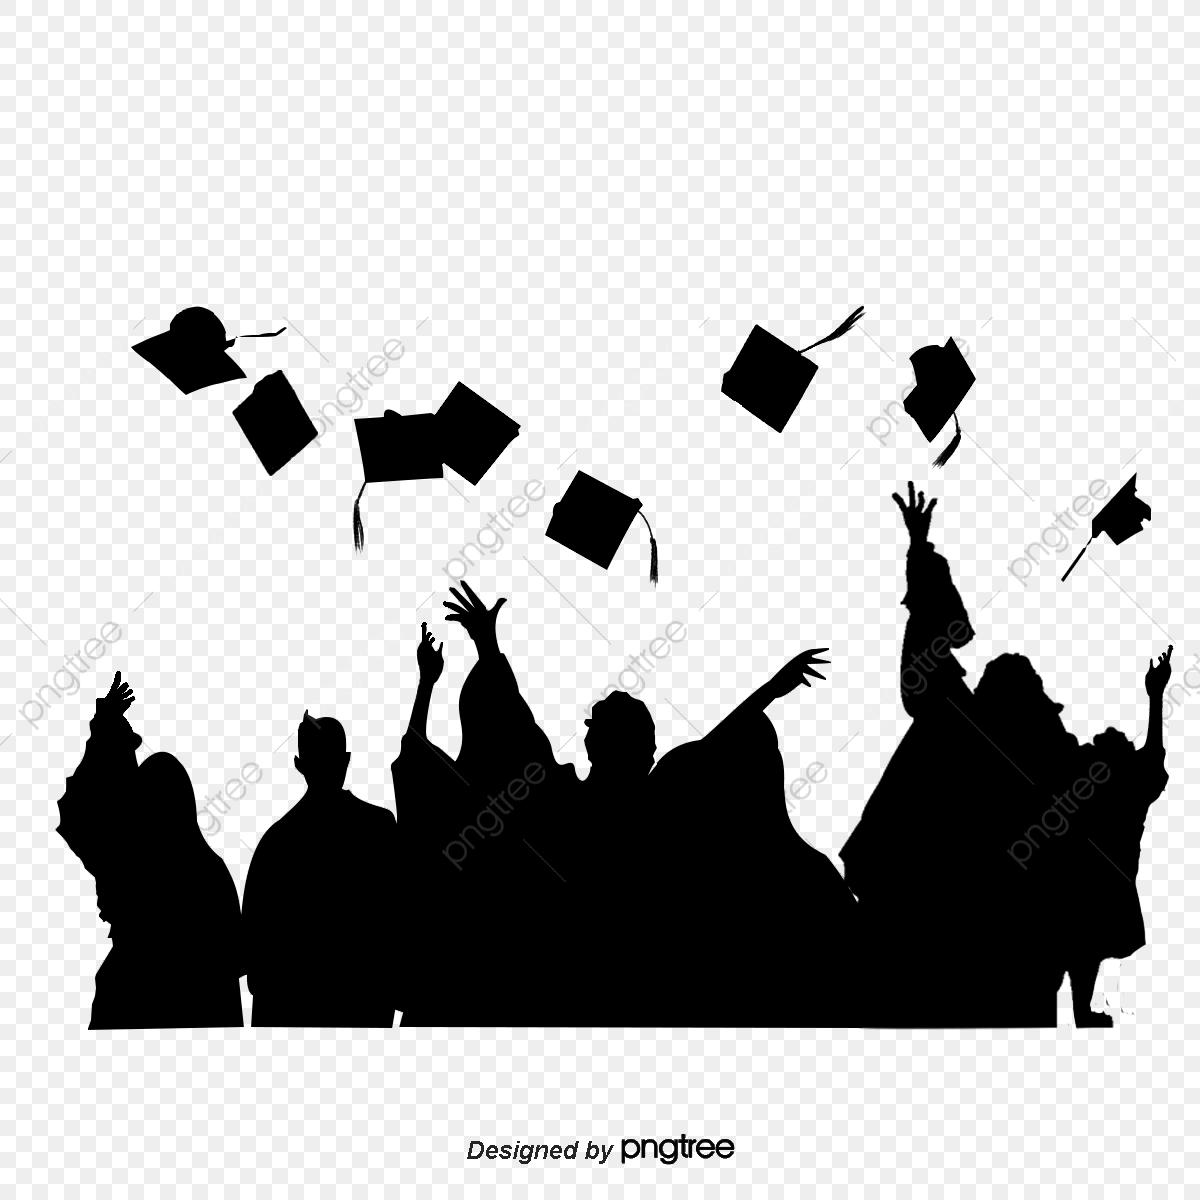 Photo Silhouette Of Graduation Cap, Silhouette Of Graduation Cap.